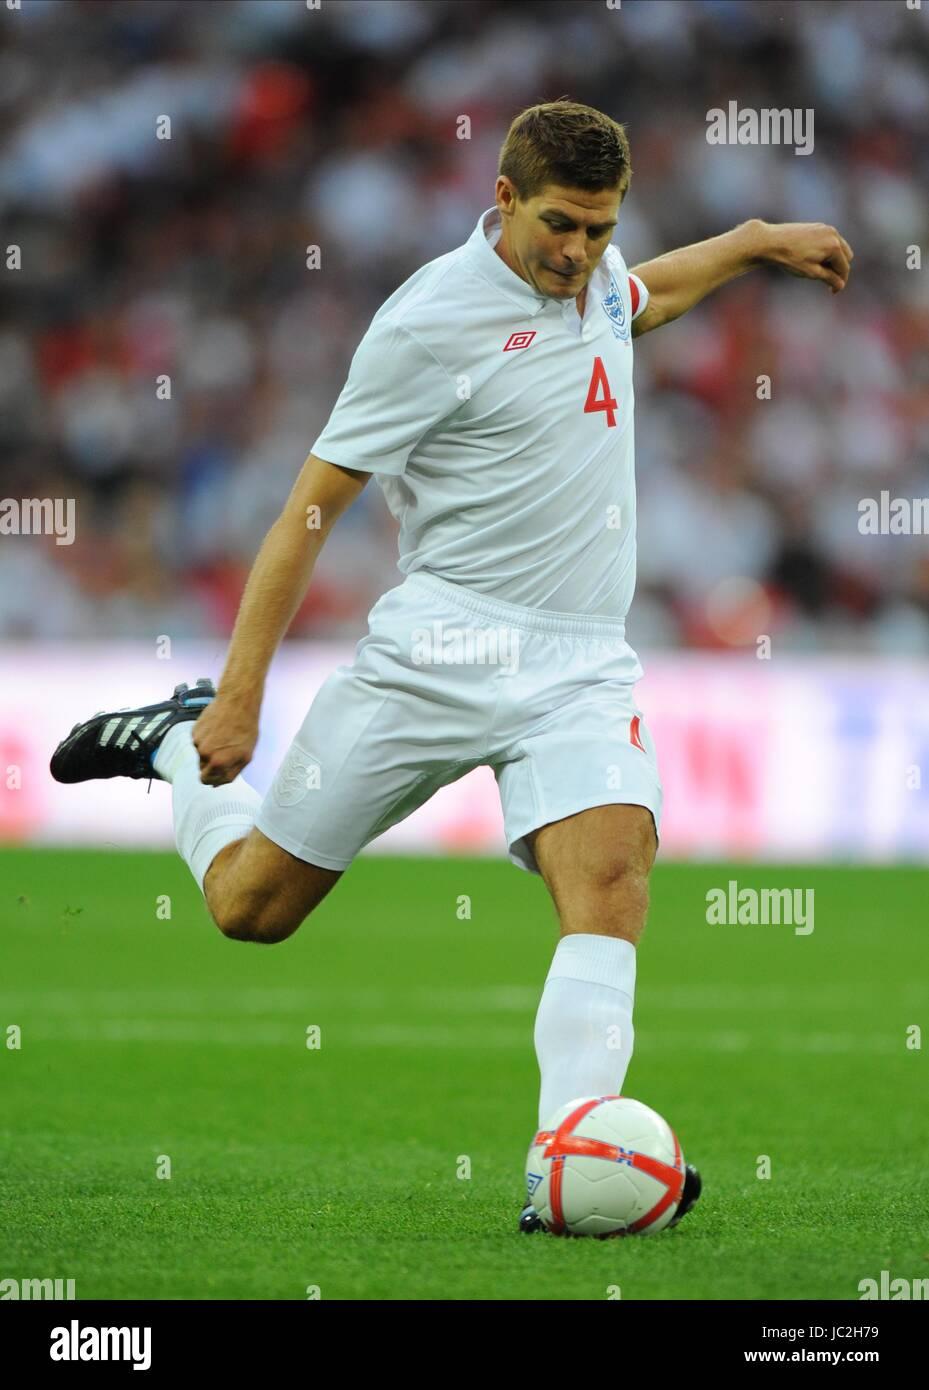 STEVEN GERRARD, ENGLAND, ENGLAND V HUNGARY, INTERNATIONAL FRIENDLEY, 2010 - Stock Image